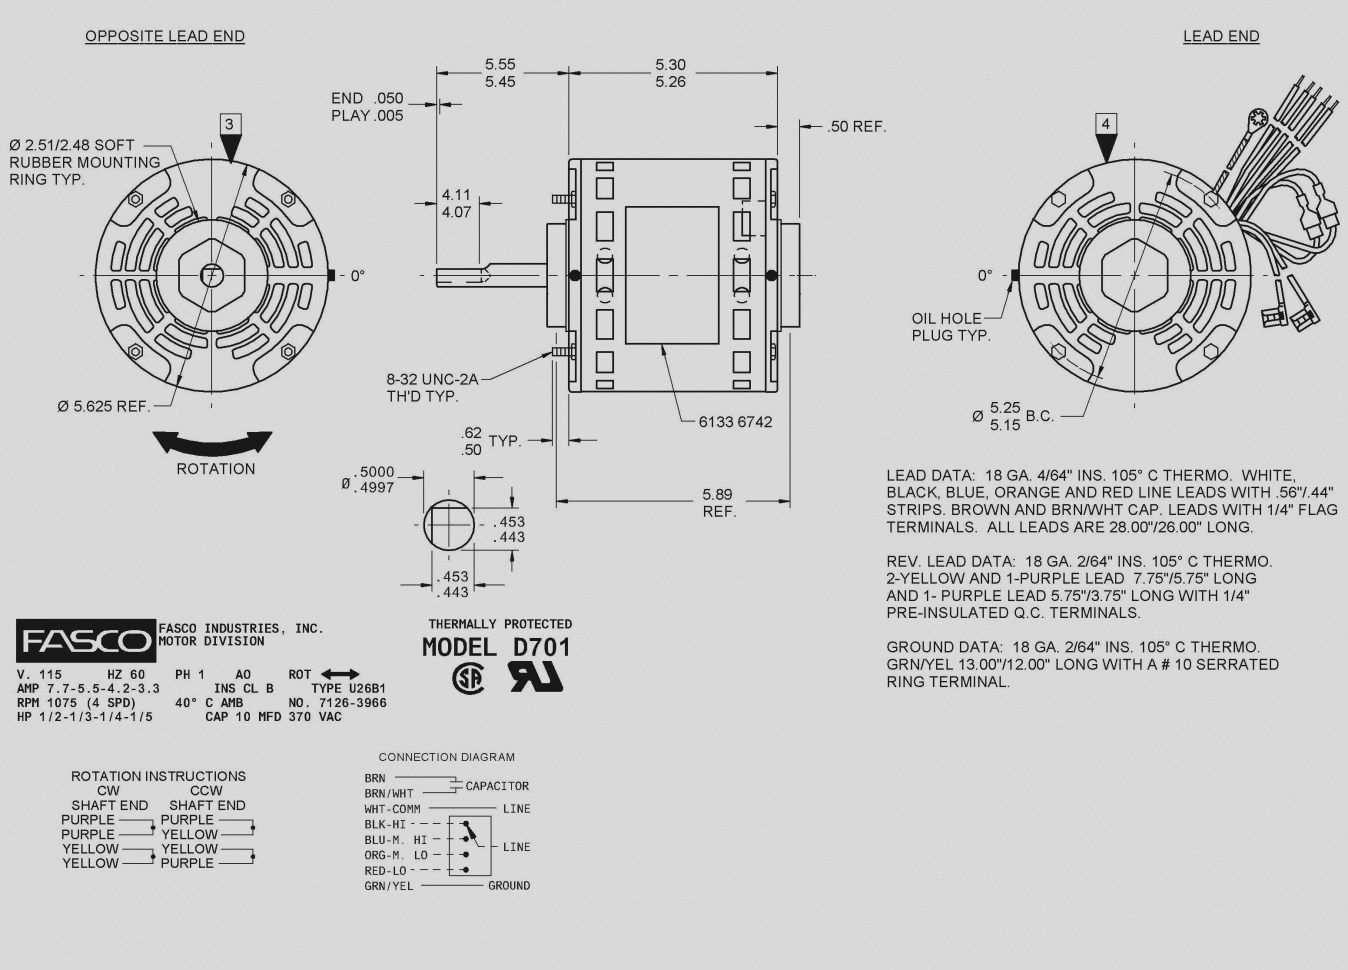 Mars 10464 Wiring Diagram - 98 Lincoln Continental Engine Diagram -  dodyjm.fiat-3600.decorresine.itWiring Diagram Resource